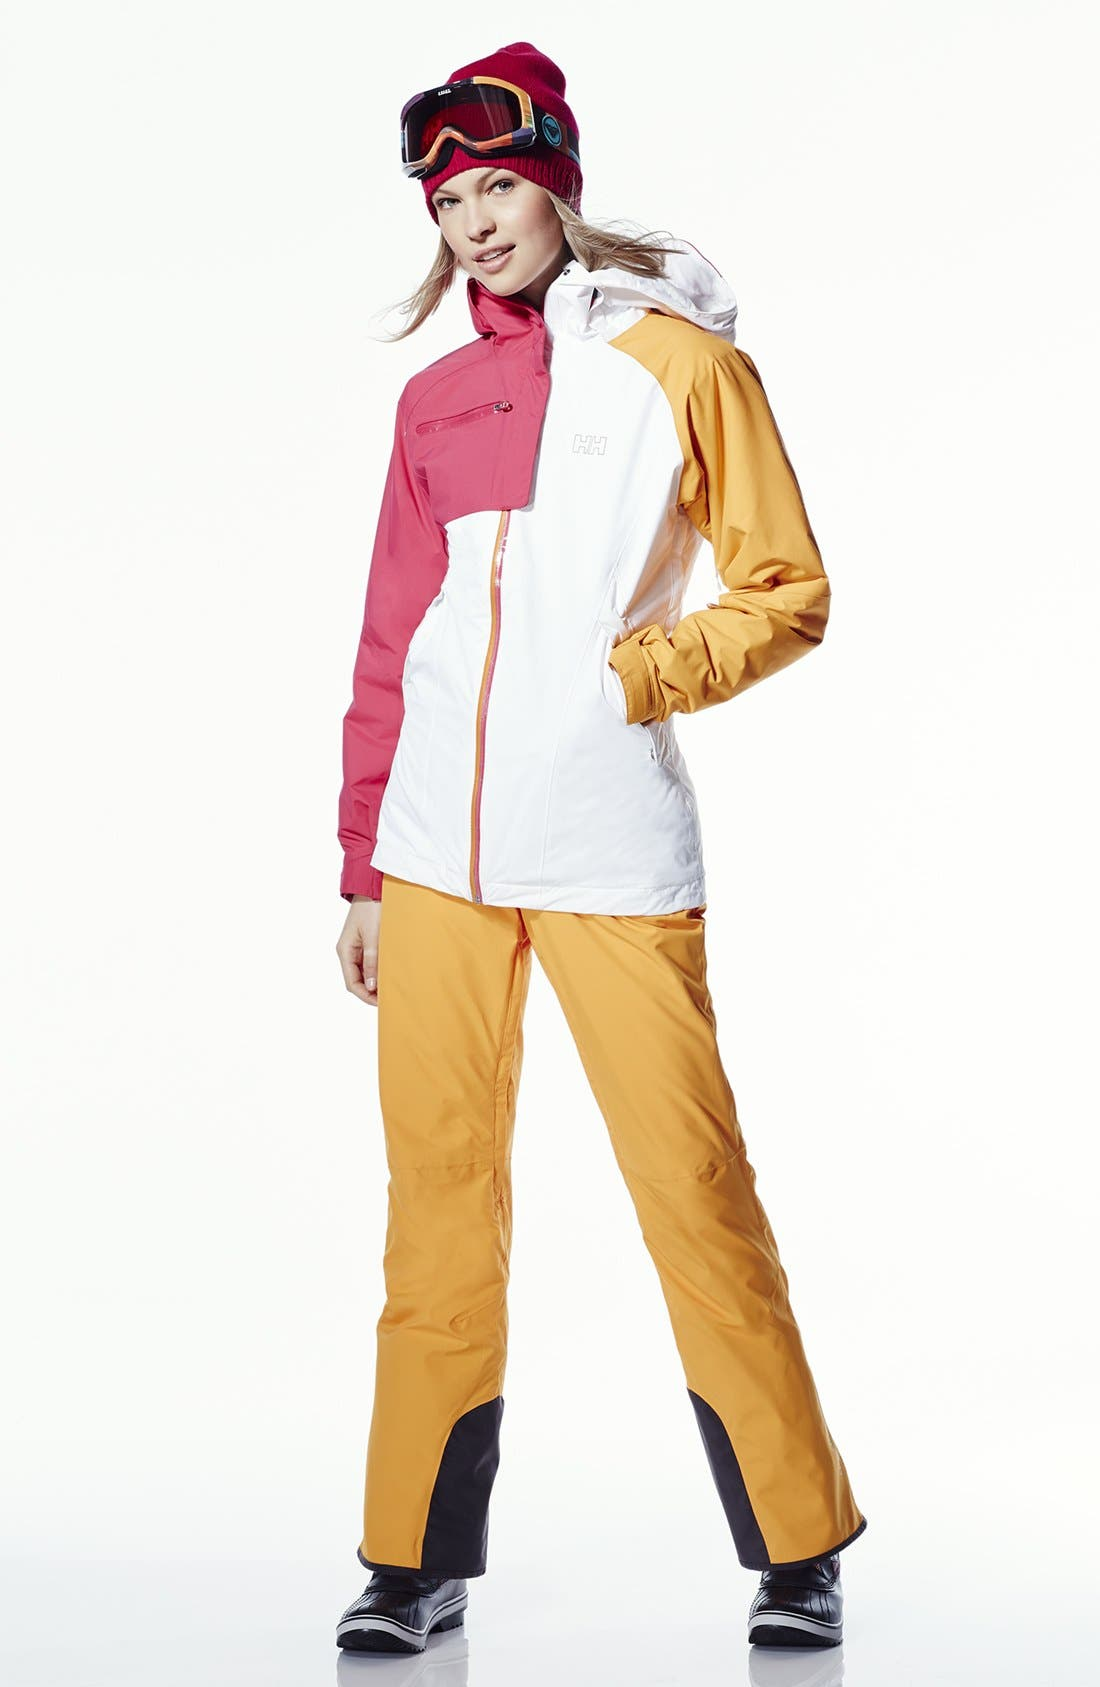 Main Image - Helly Hansen Ski Jacket & Pants